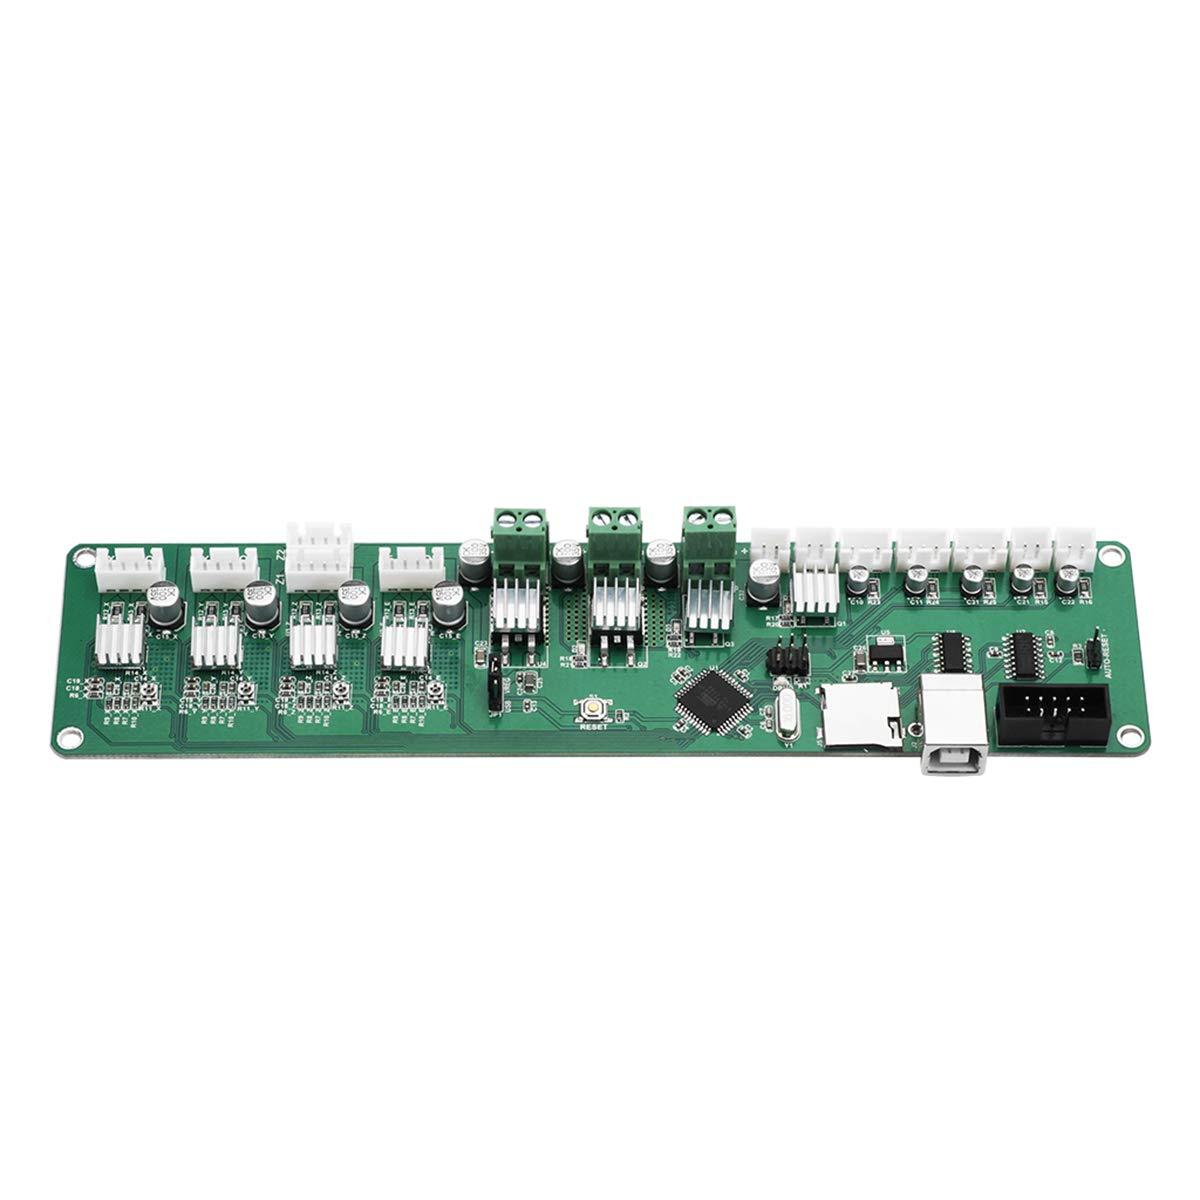 Hemobllo 3D Printer MELZI 2.0 MEGA1284P HR4982 Controller Board DIY Accessory Part